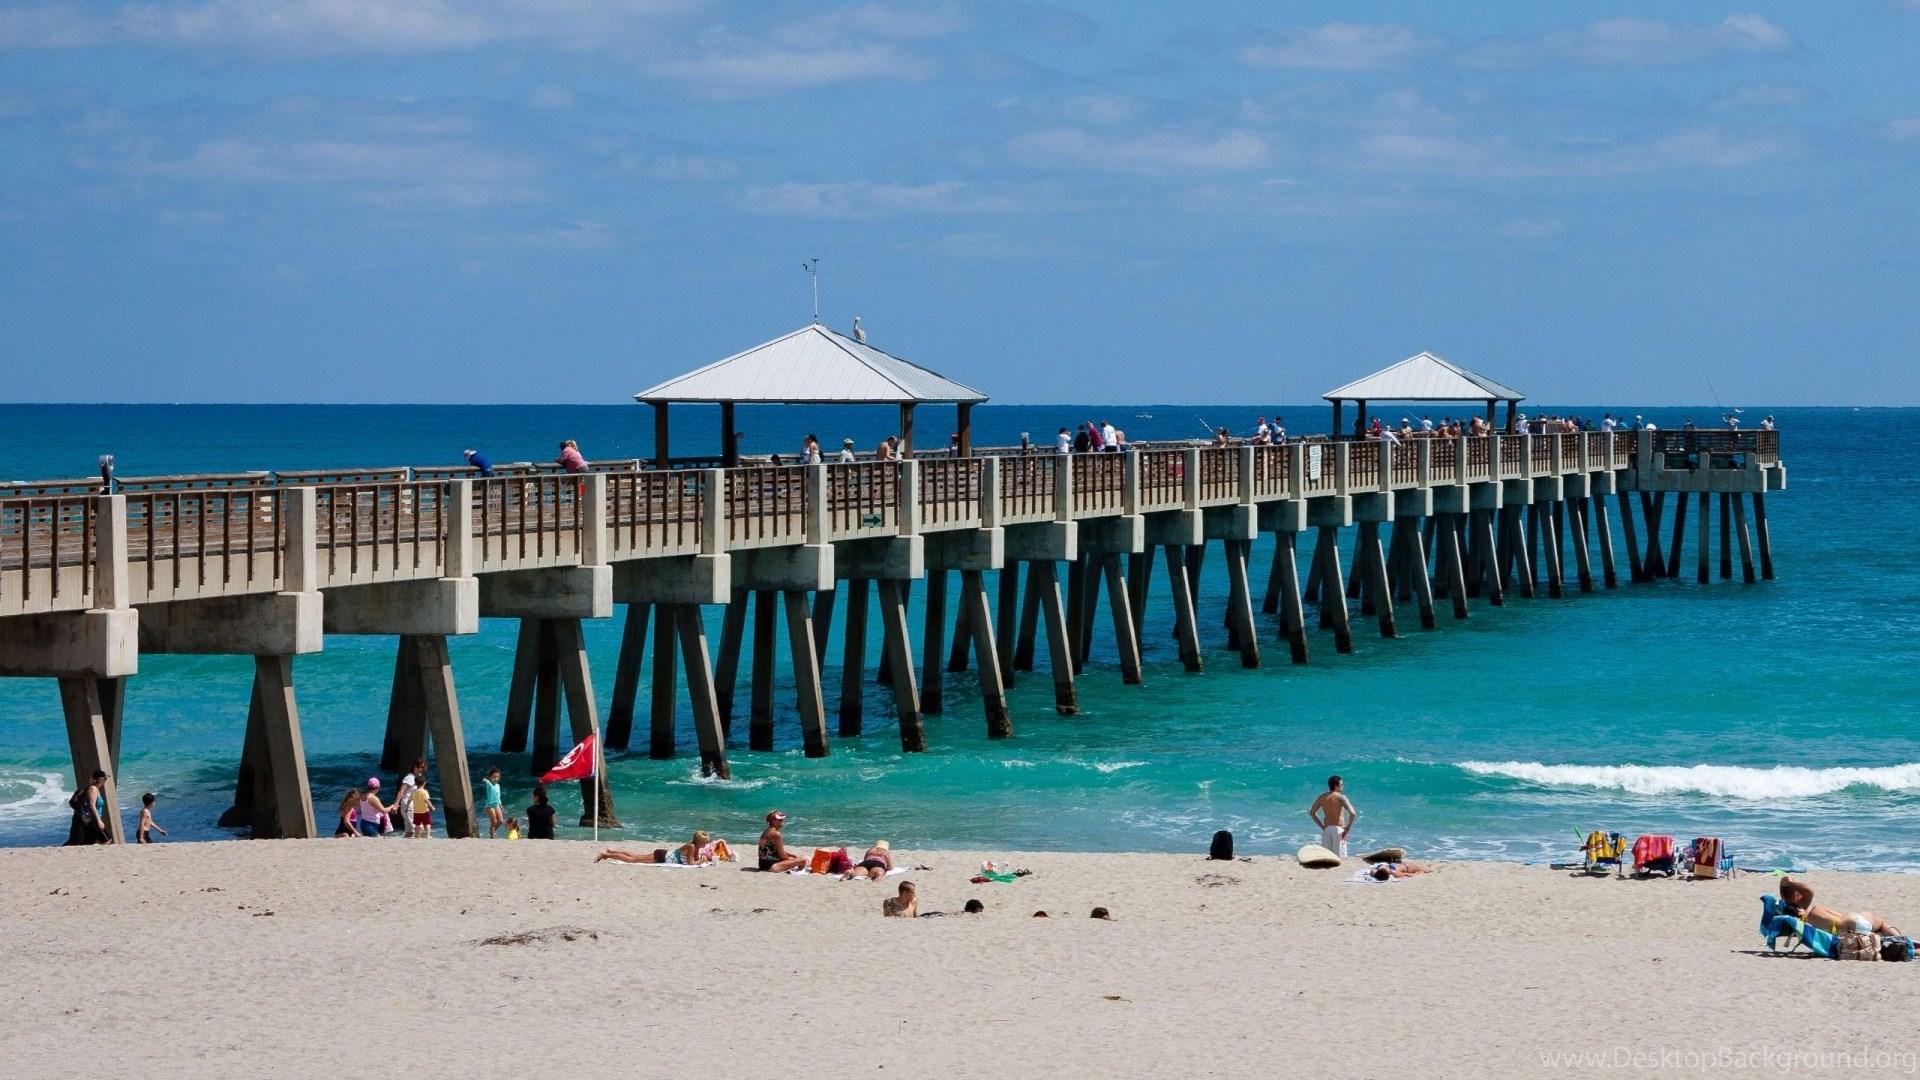 Goa Beach Parallax Hd Iphone Ipad Wallpaper: Florida Beach Bridge Hd Wallpapers Free Desktop Beach